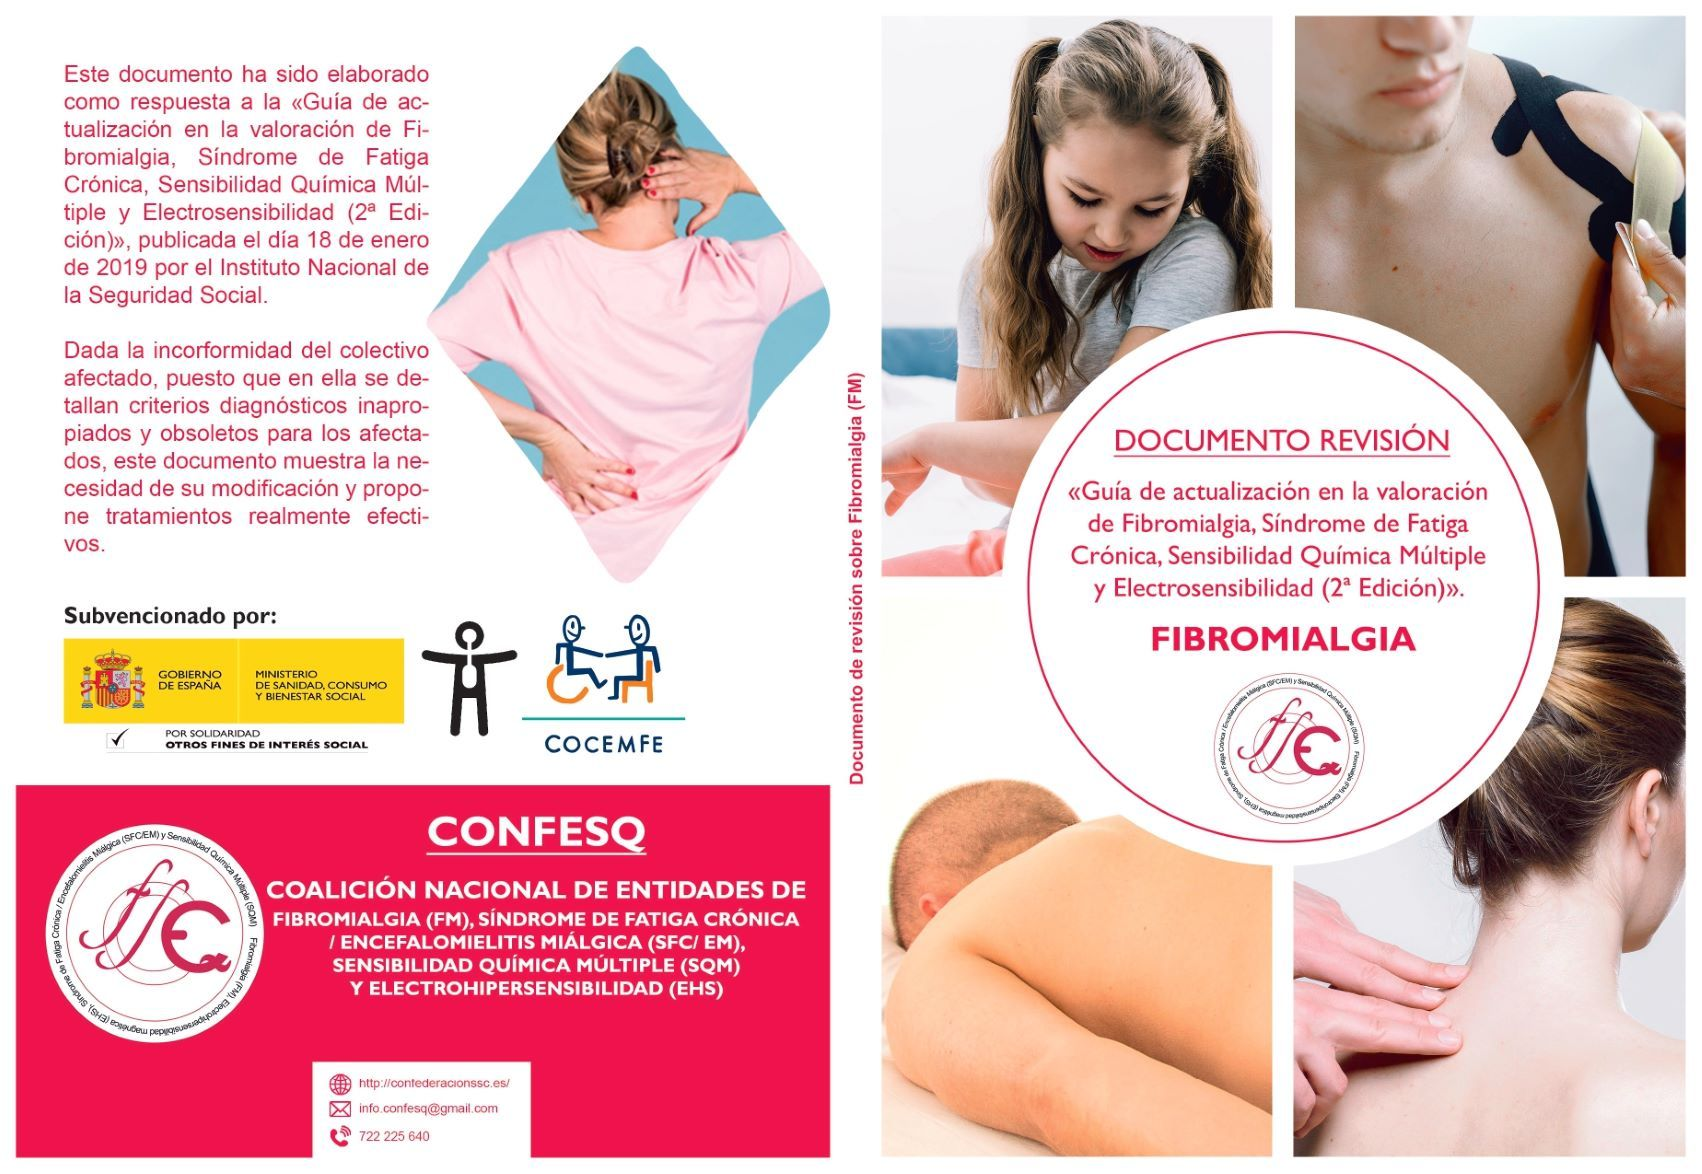 Foto de Documento de Revisión a la Guia del INSS sobre Fibromialgia